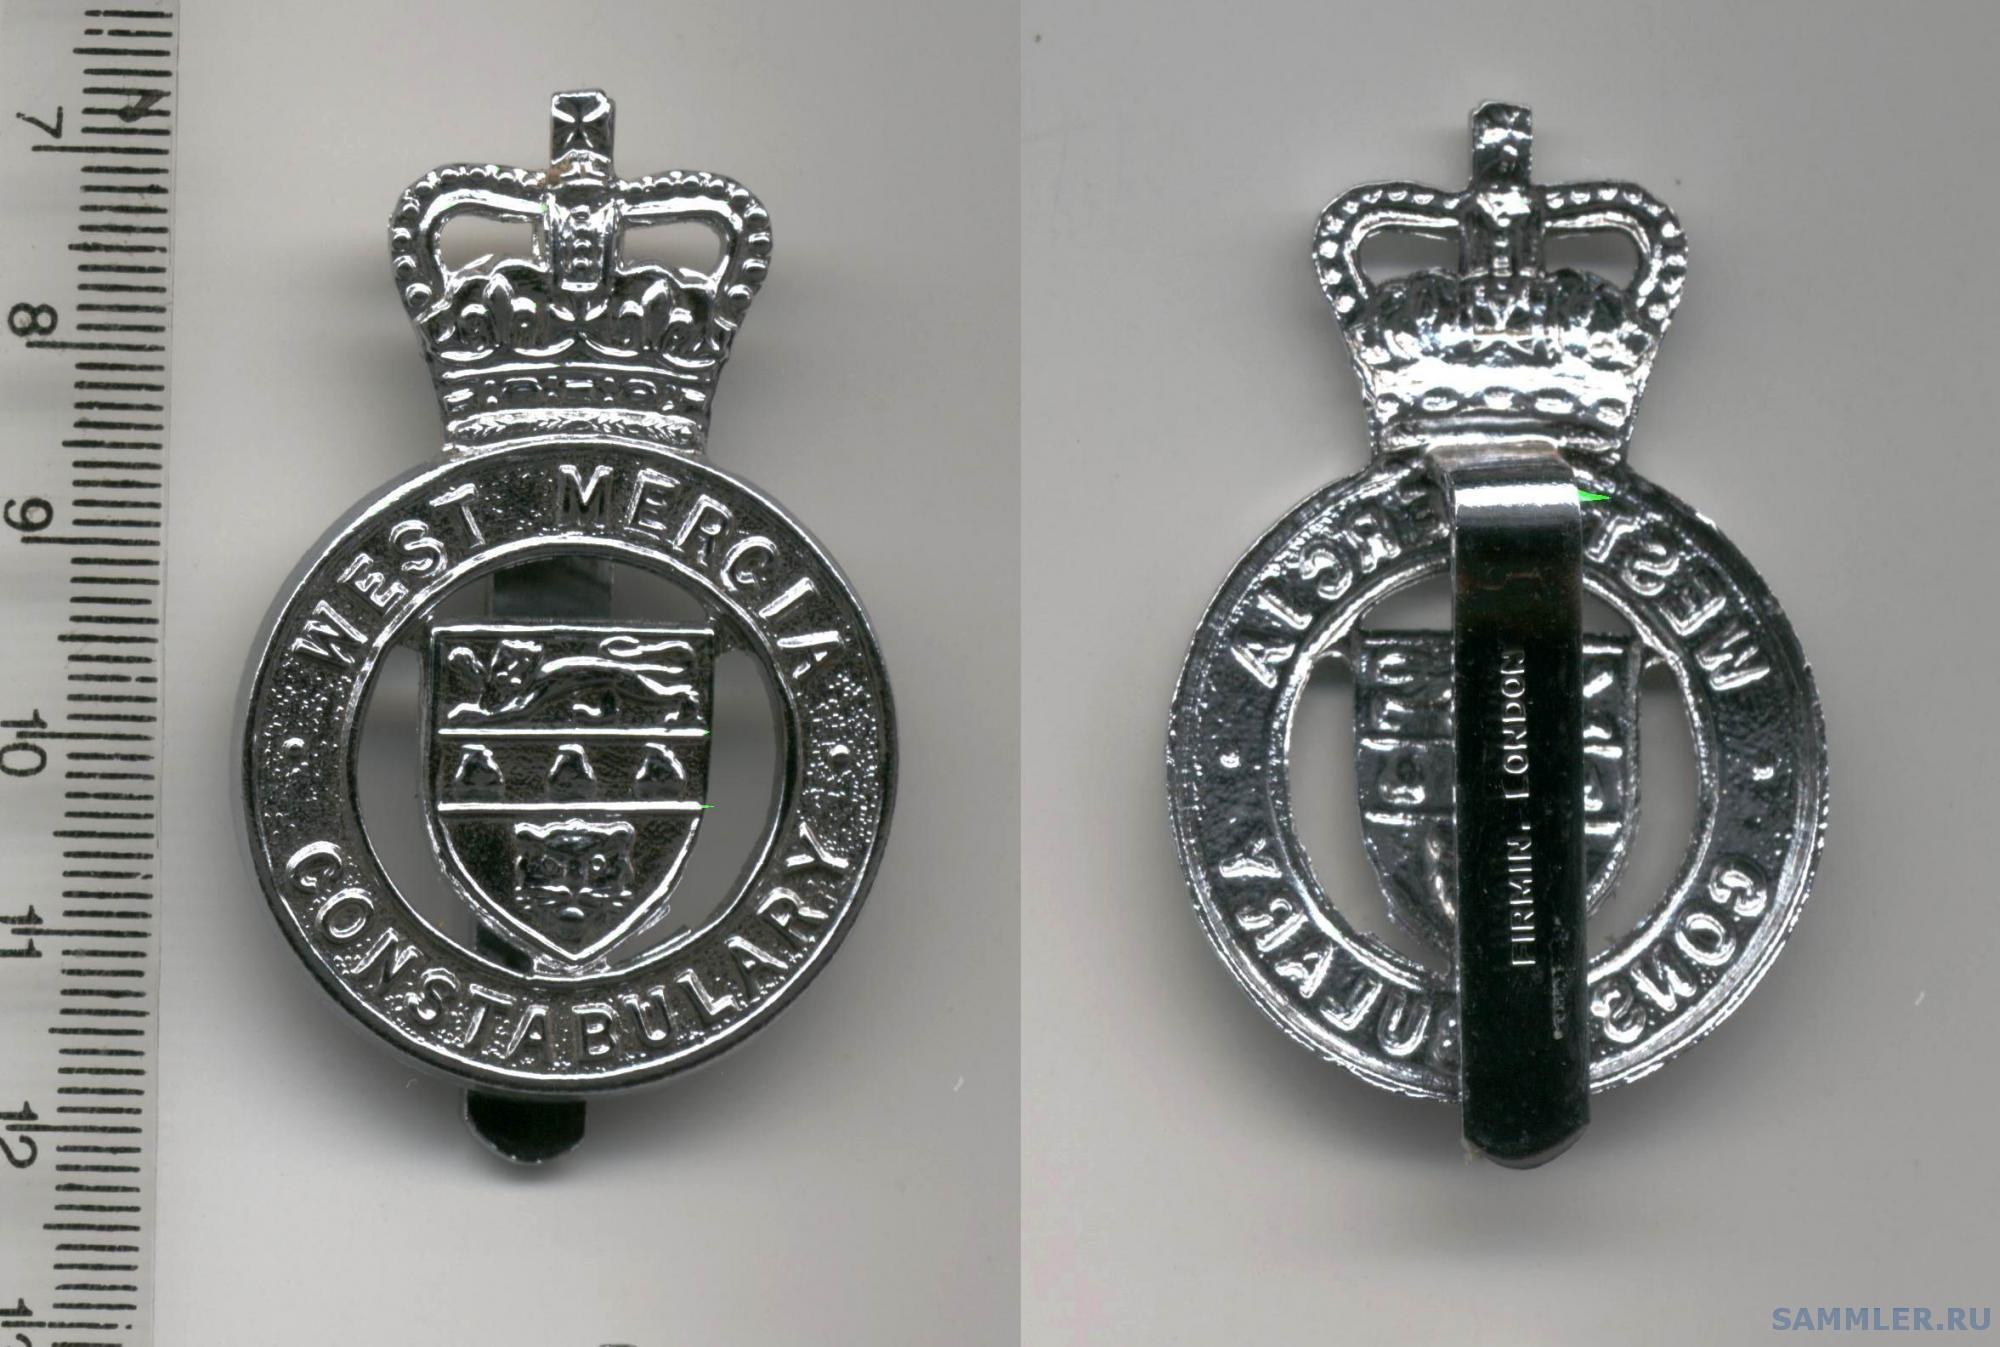 The West Mercia Police cap badge EII.jpg